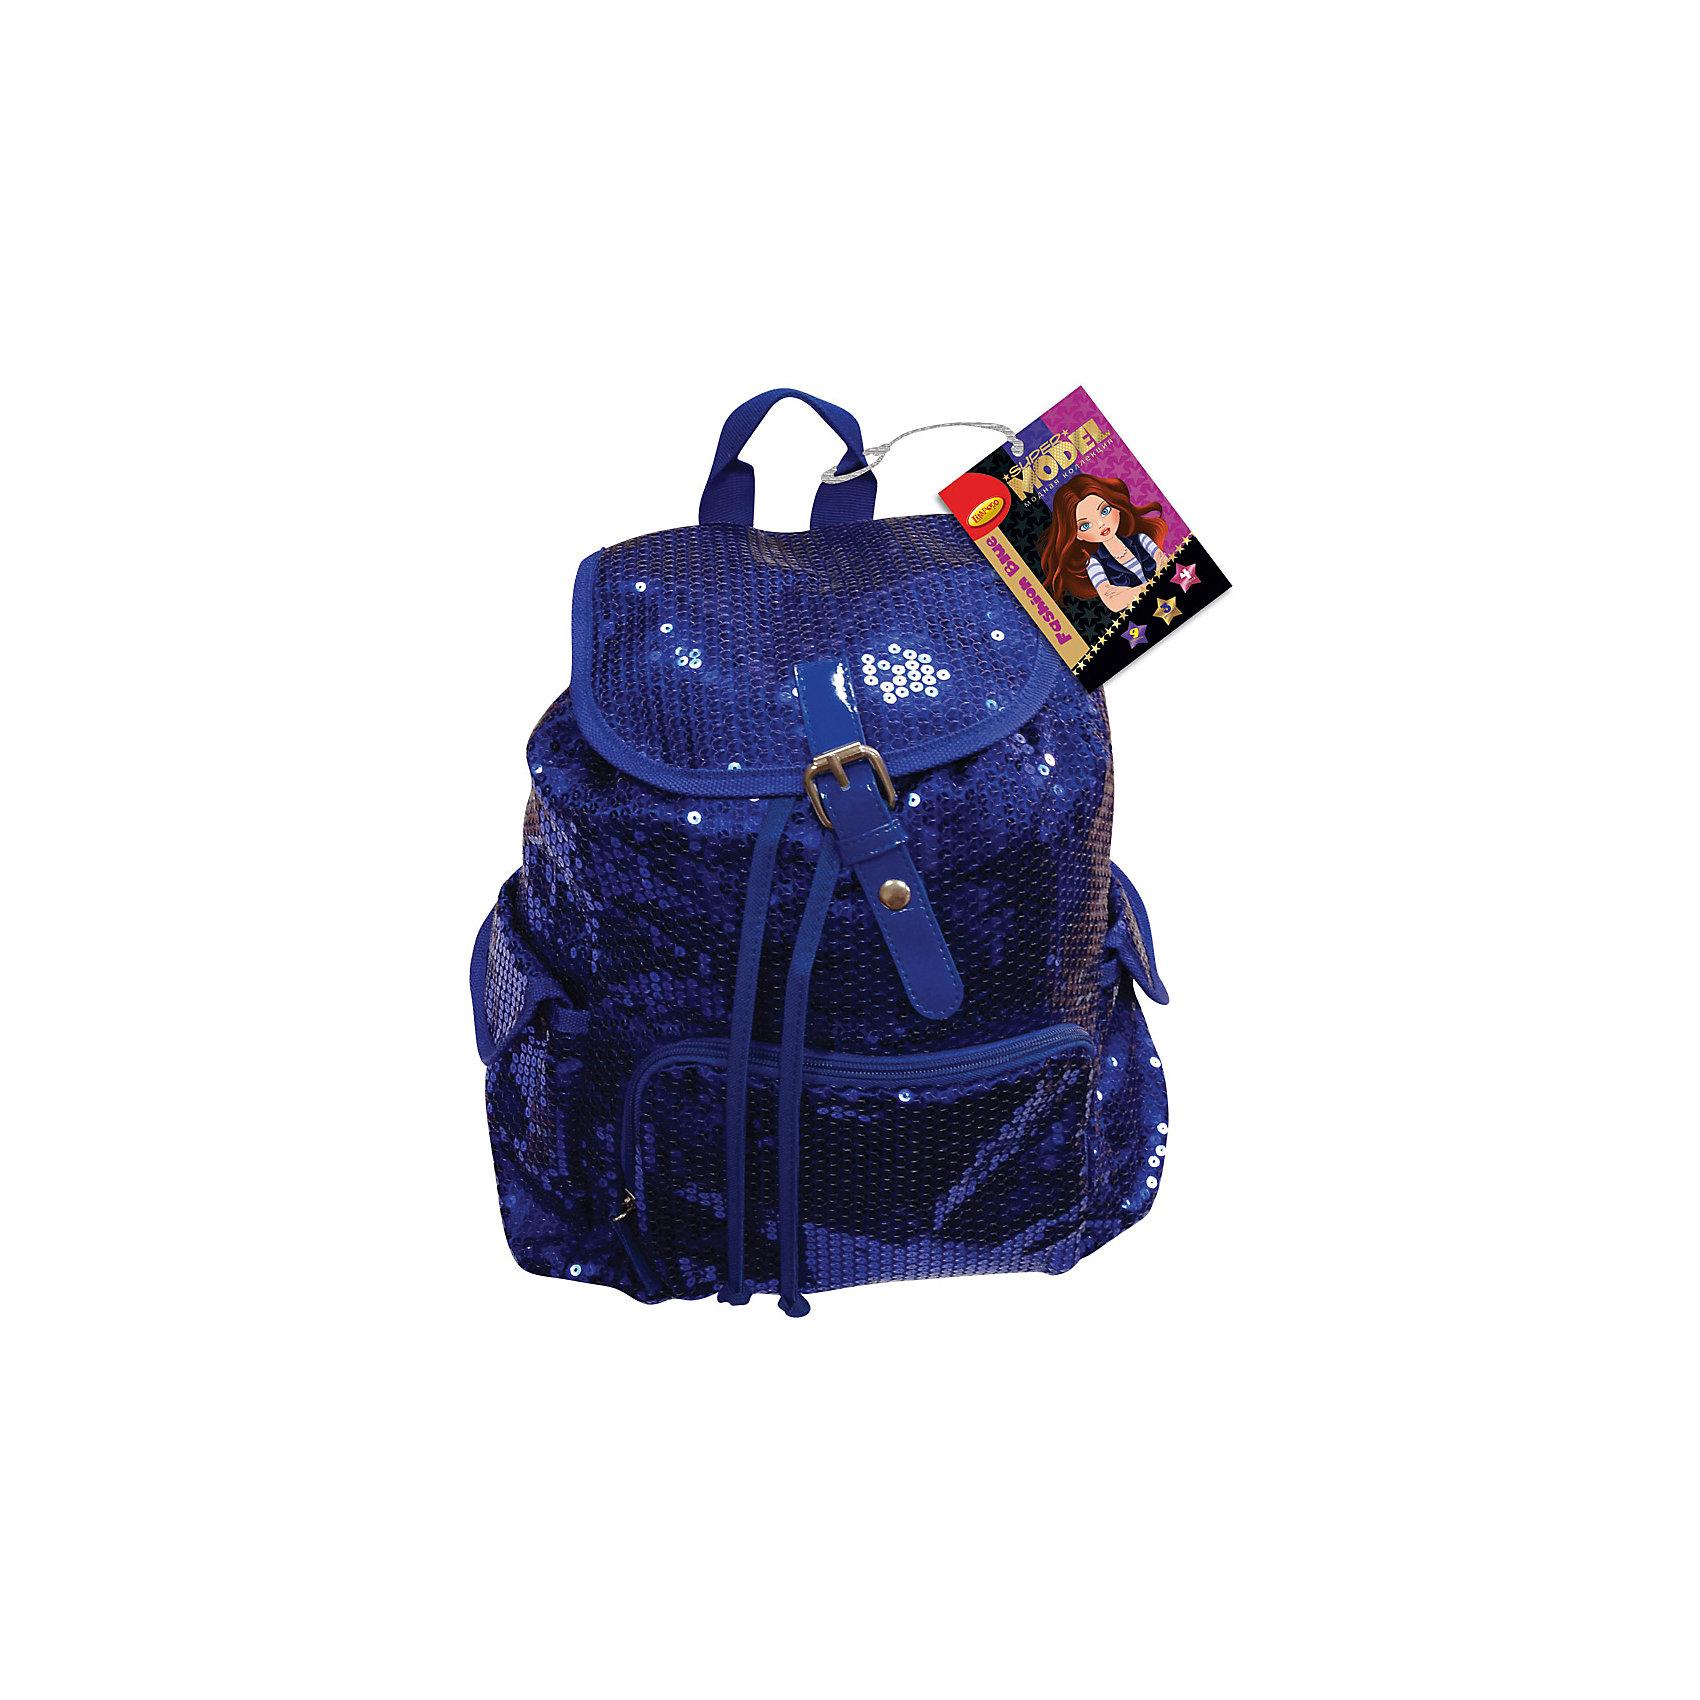 Синий рюкзак Fashion Style Super ModelРюкзак Fashion Style Limpopo отд.на молнии, передн.карман, 2 боковых кармана, уплотненные лямки блестящая ткань с пайетками синий Super Model 3<br><br>Ширина мм: 390<br>Глубина мм: 30<br>Высота мм: 380<br>Вес г: 583<br>Возраст от месяцев: 84<br>Возраст до месяцев: 216<br>Пол: Женский<br>Возраст: Детский<br>SKU: 5390346